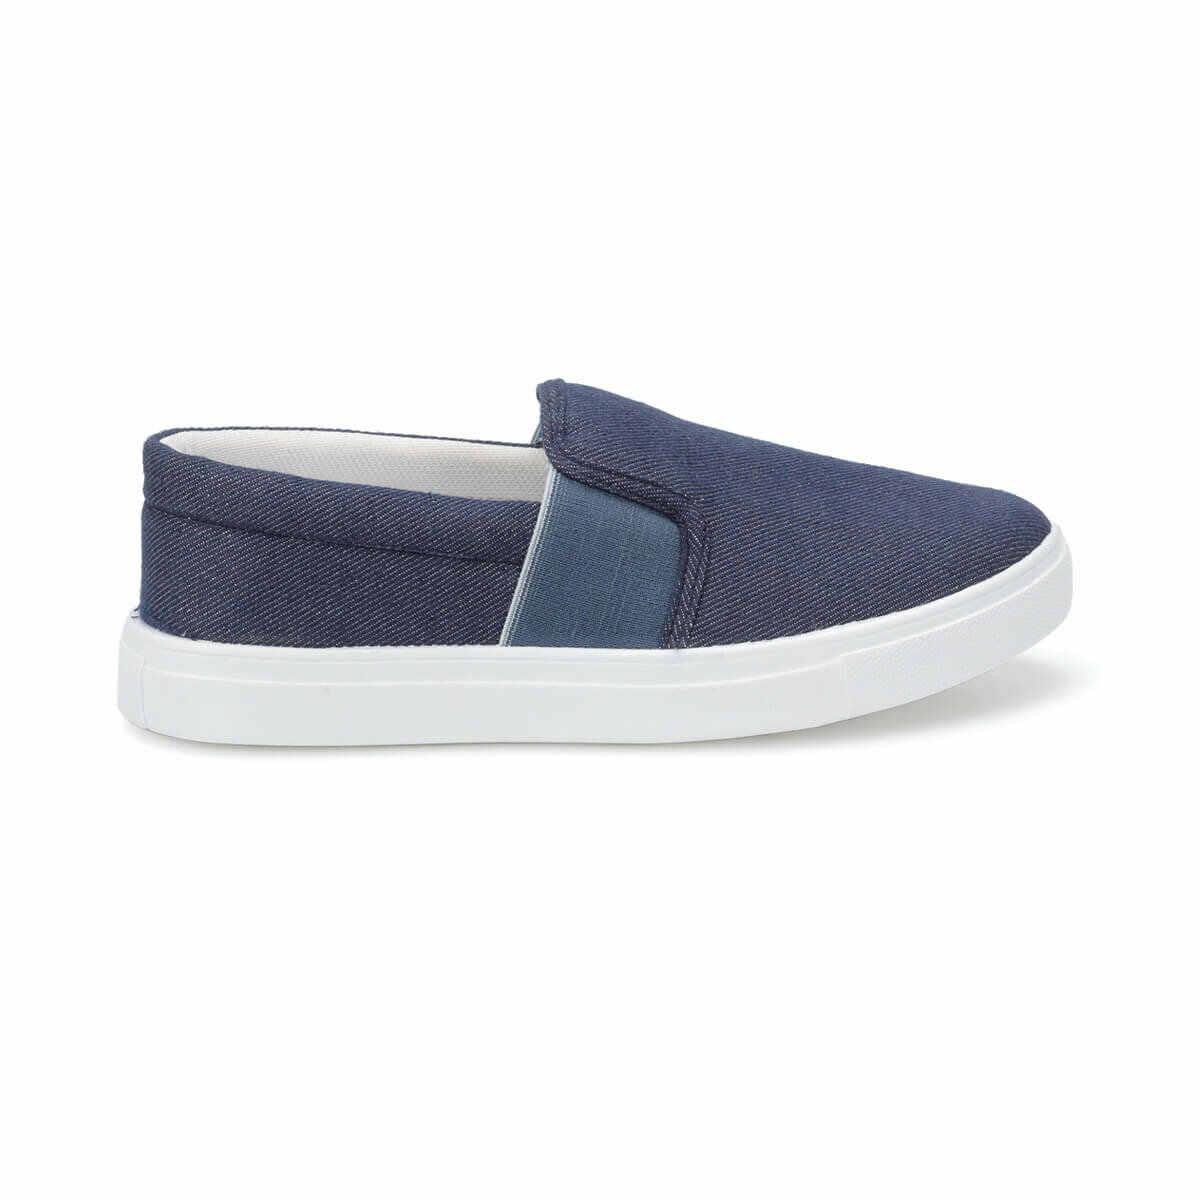 FLO CS19011 синий Для женщин 'S обувь без шнуровки арт Bella